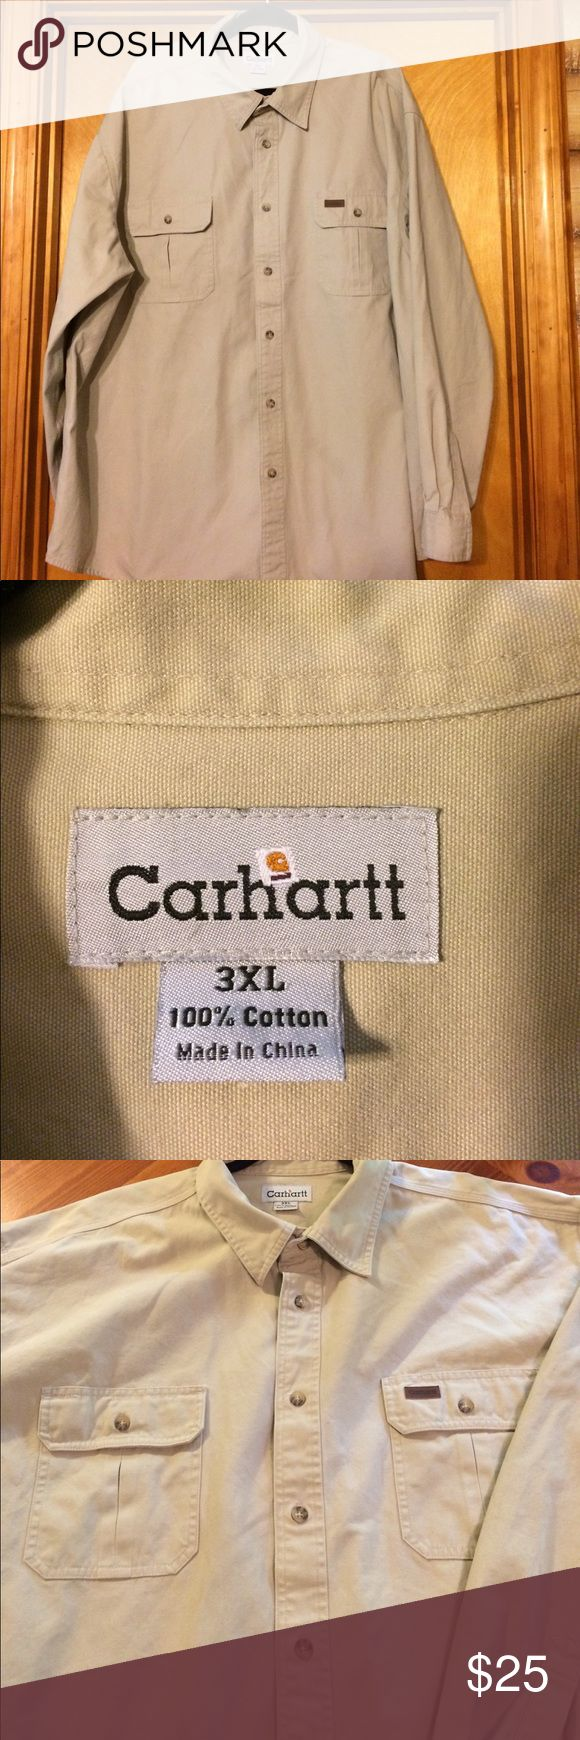 Cathartic Khaki Work Shirt Cathartt Khaki Shirt. 3XL. Worn 1 Time. Carhartt Shirts Casual Button Down Shirts